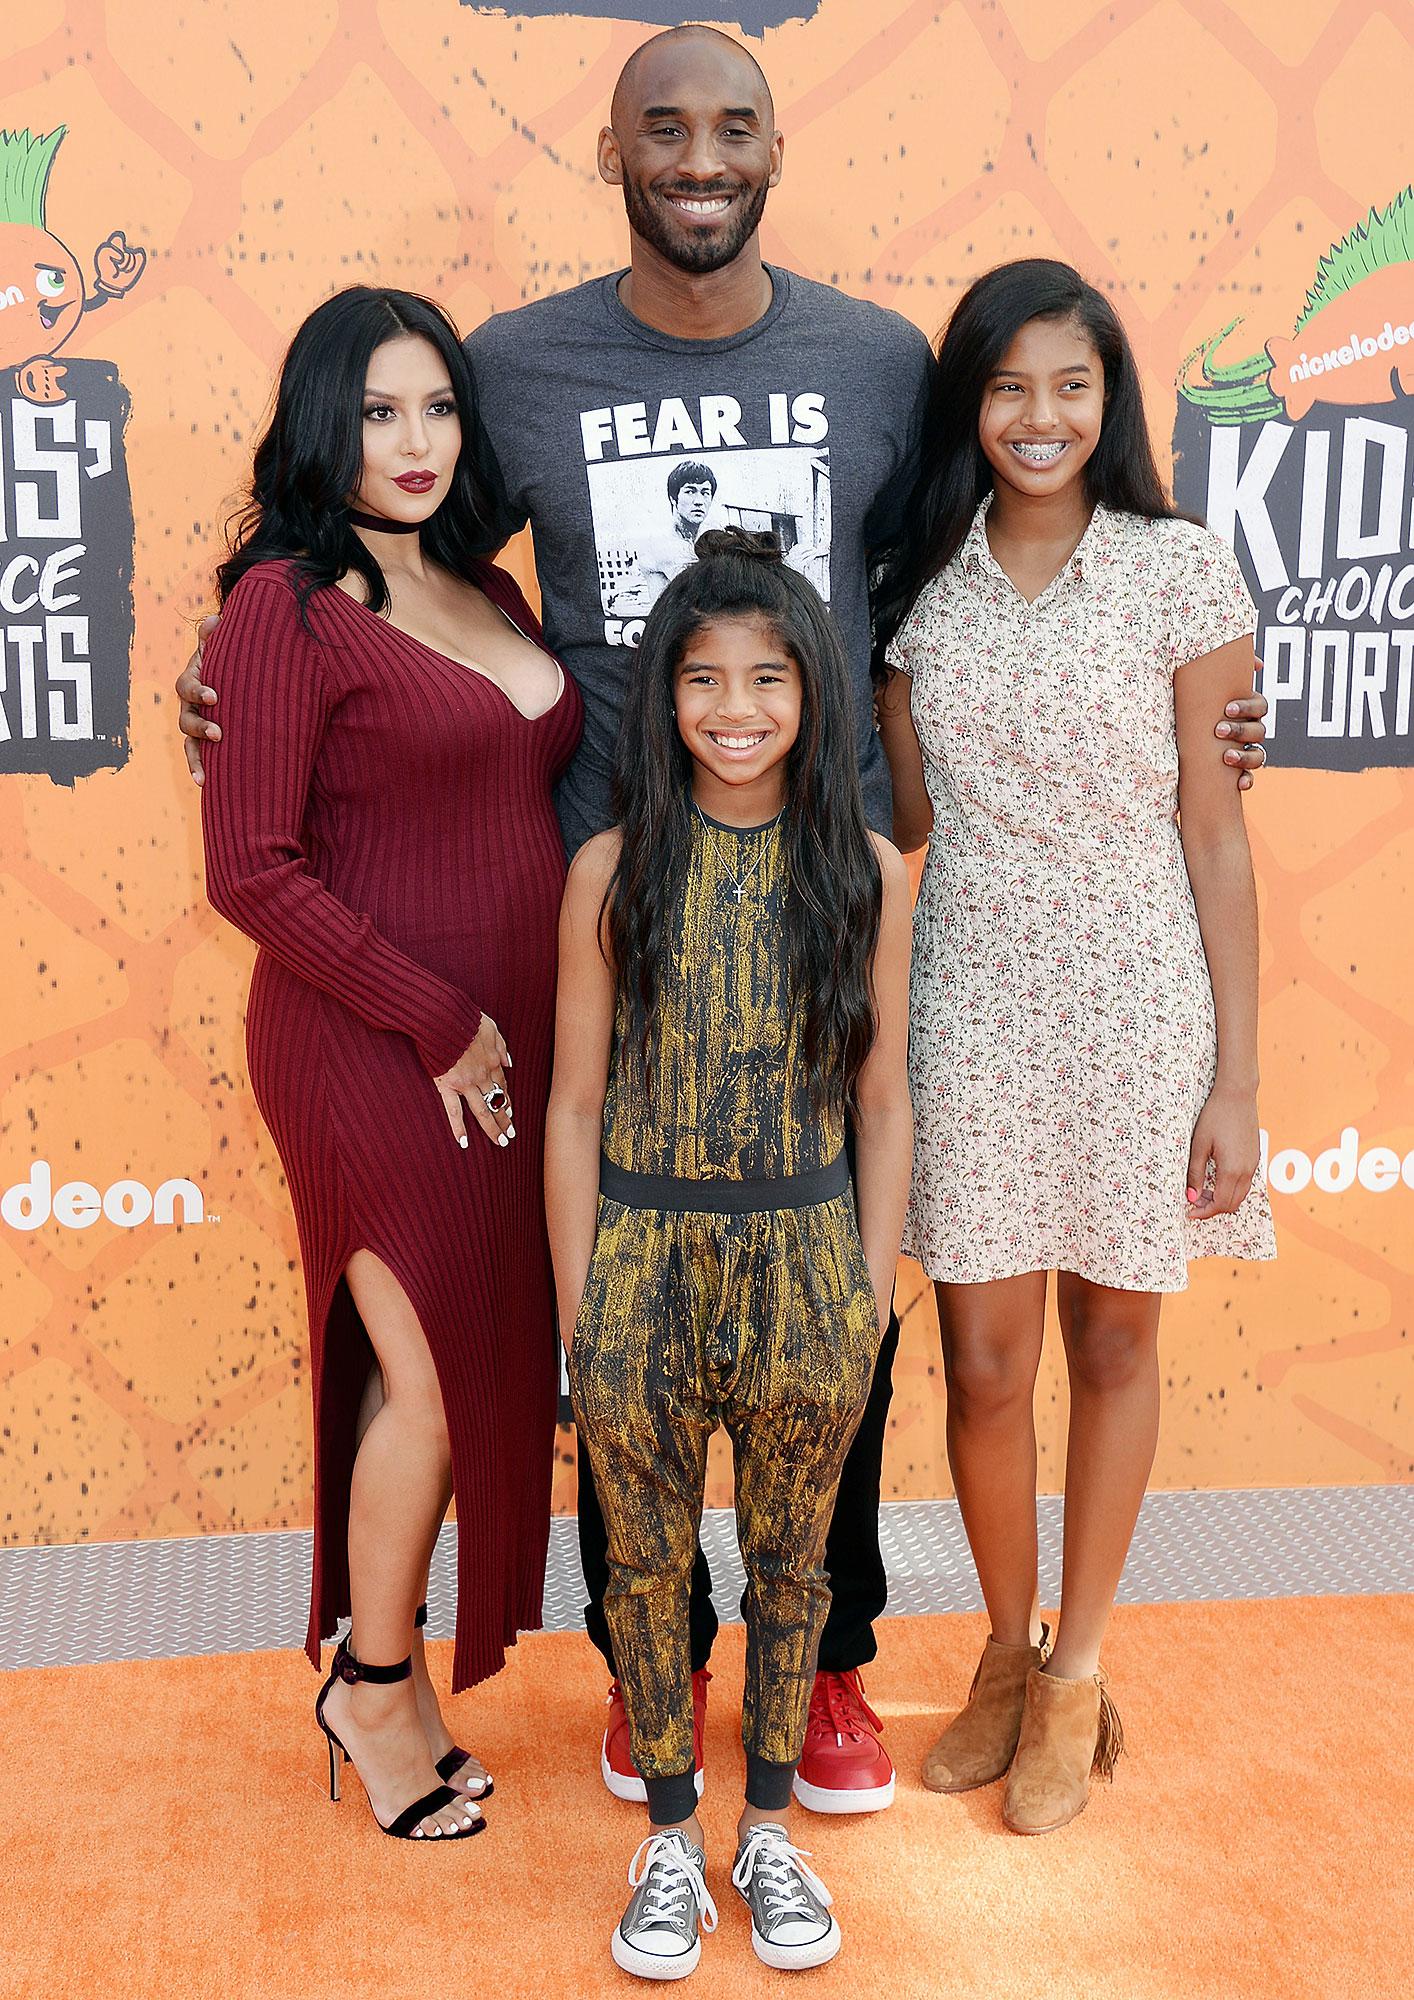 Kobe Bryant with Wife Vanessa and Daughters Natalia and Gianna